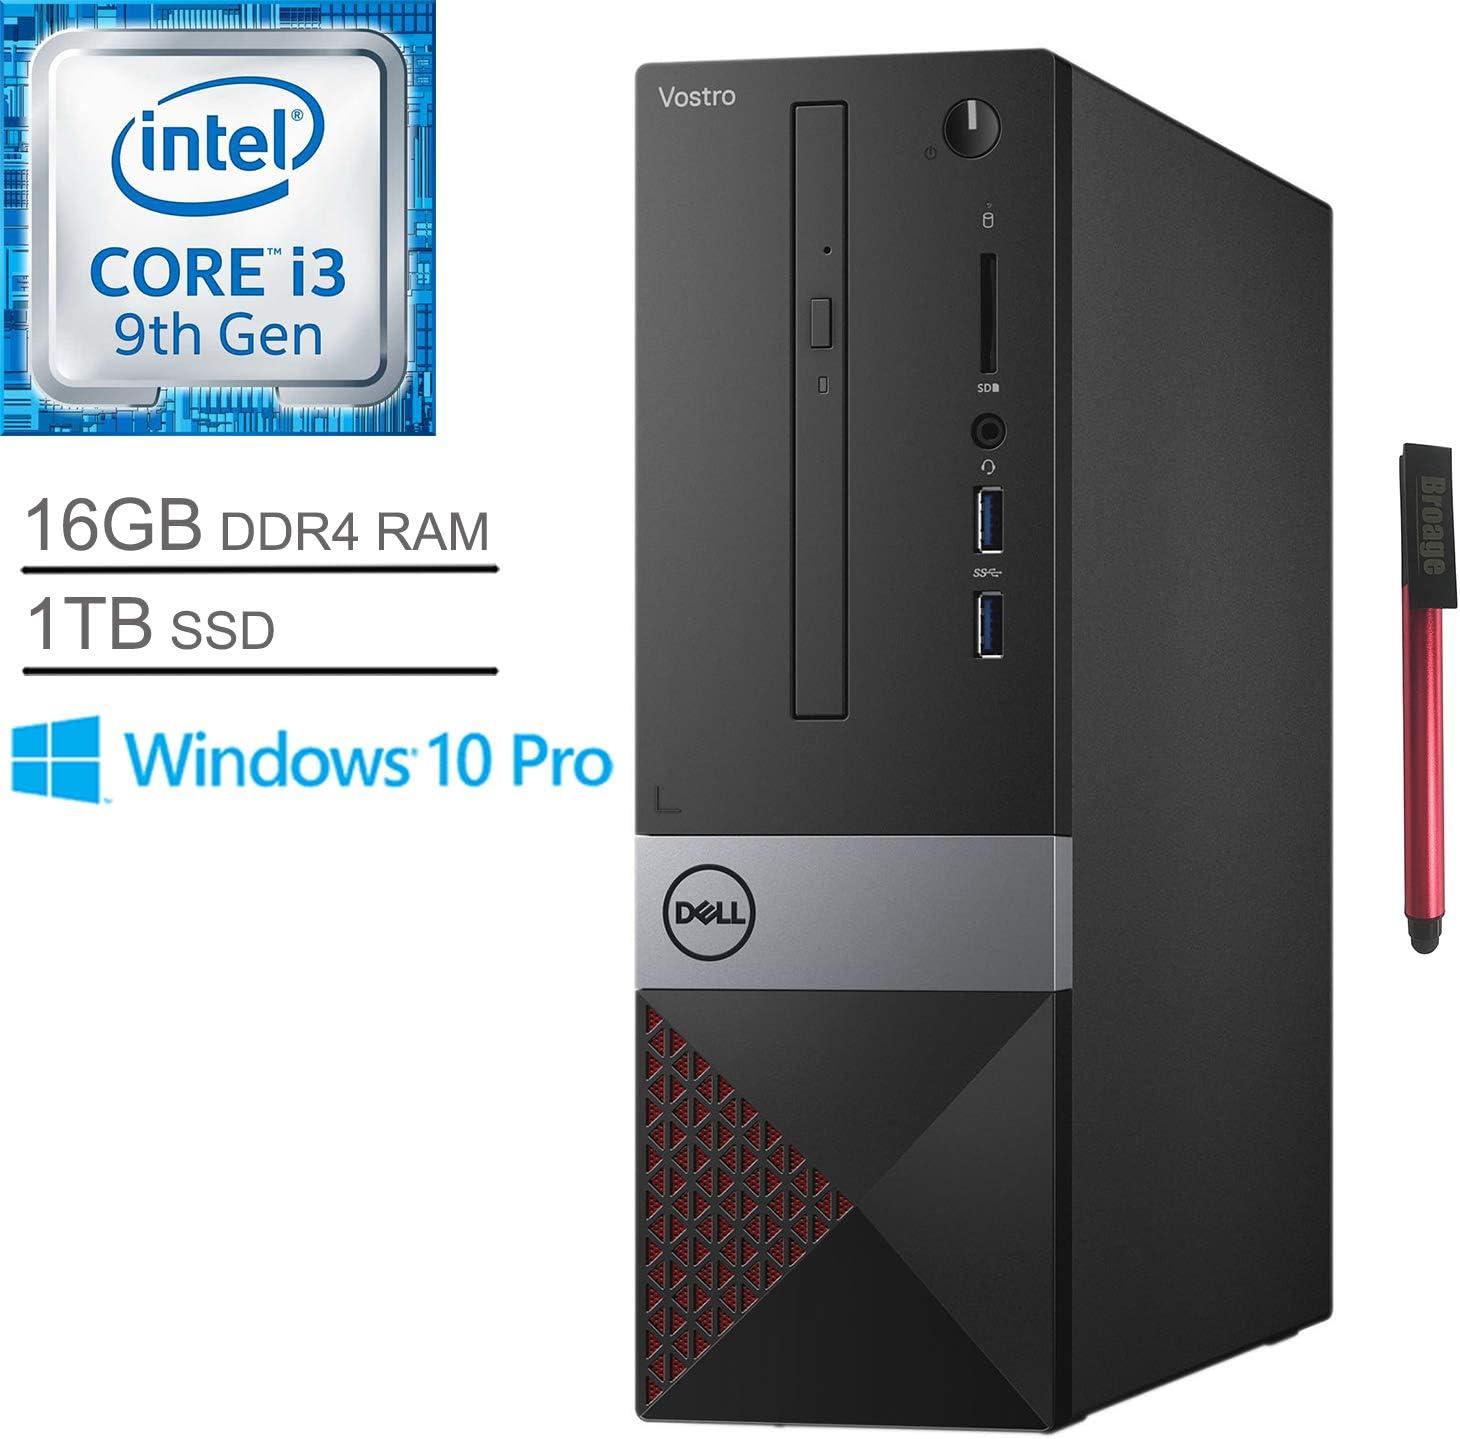 Dell Vostro 3471 Business Small Desktop Computer, Intel Quad-Core i3 9100 Up to 4.2GHz (Beats i5-7400), 16GB DDR4 RAM, 1TB SSD, DVDRW, WiFi, Bluetooth, HDMI, Windows 10 Pro, BROAGE 64GB Flash Stylus